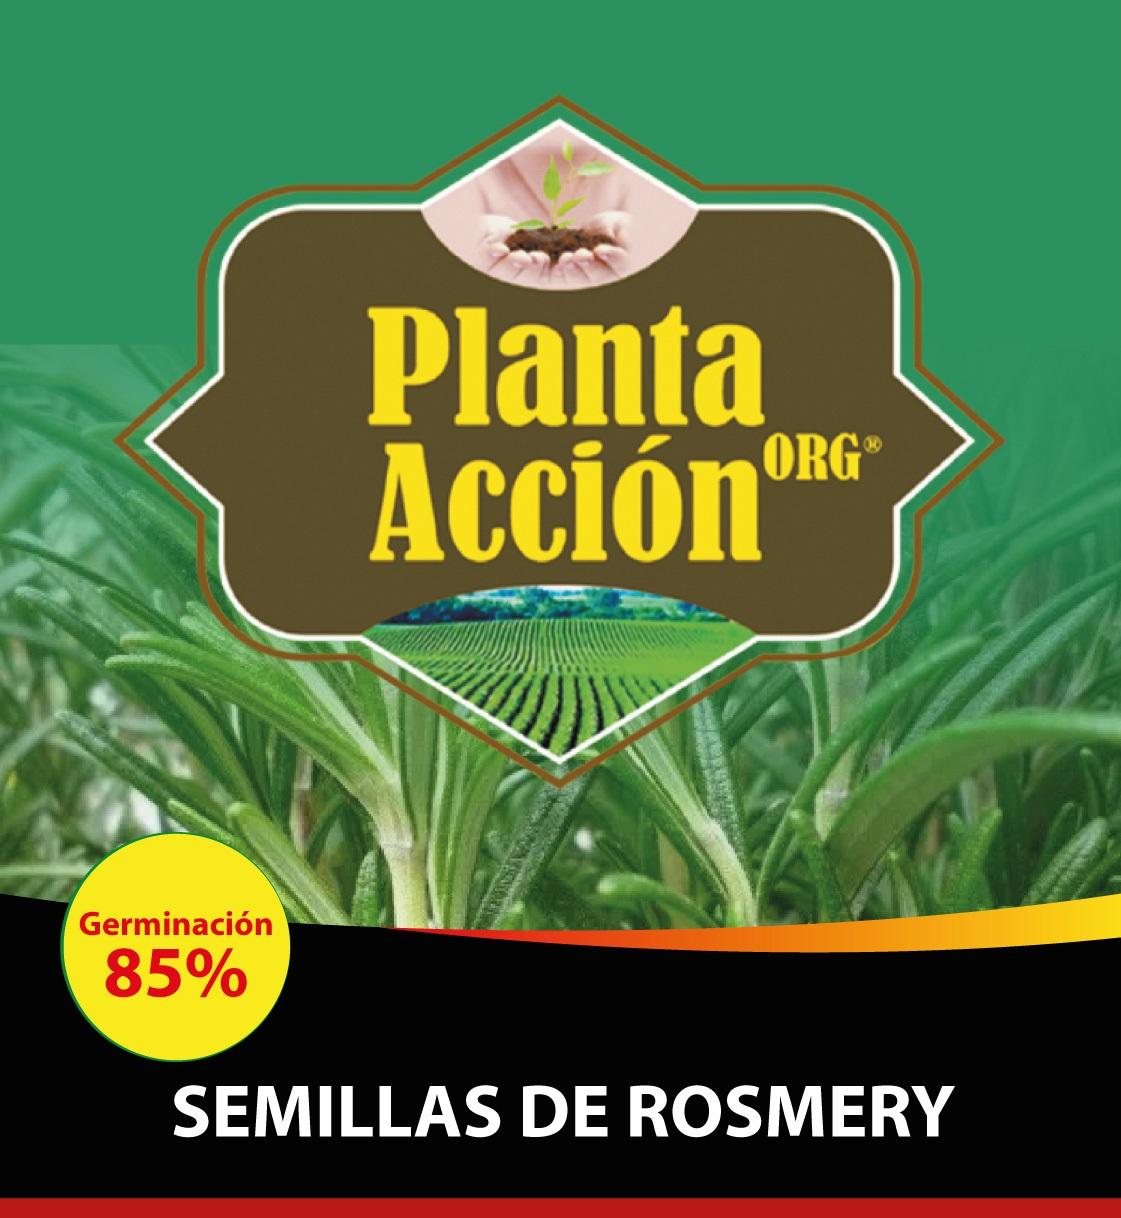 SEMILLAS DE ROSMERY